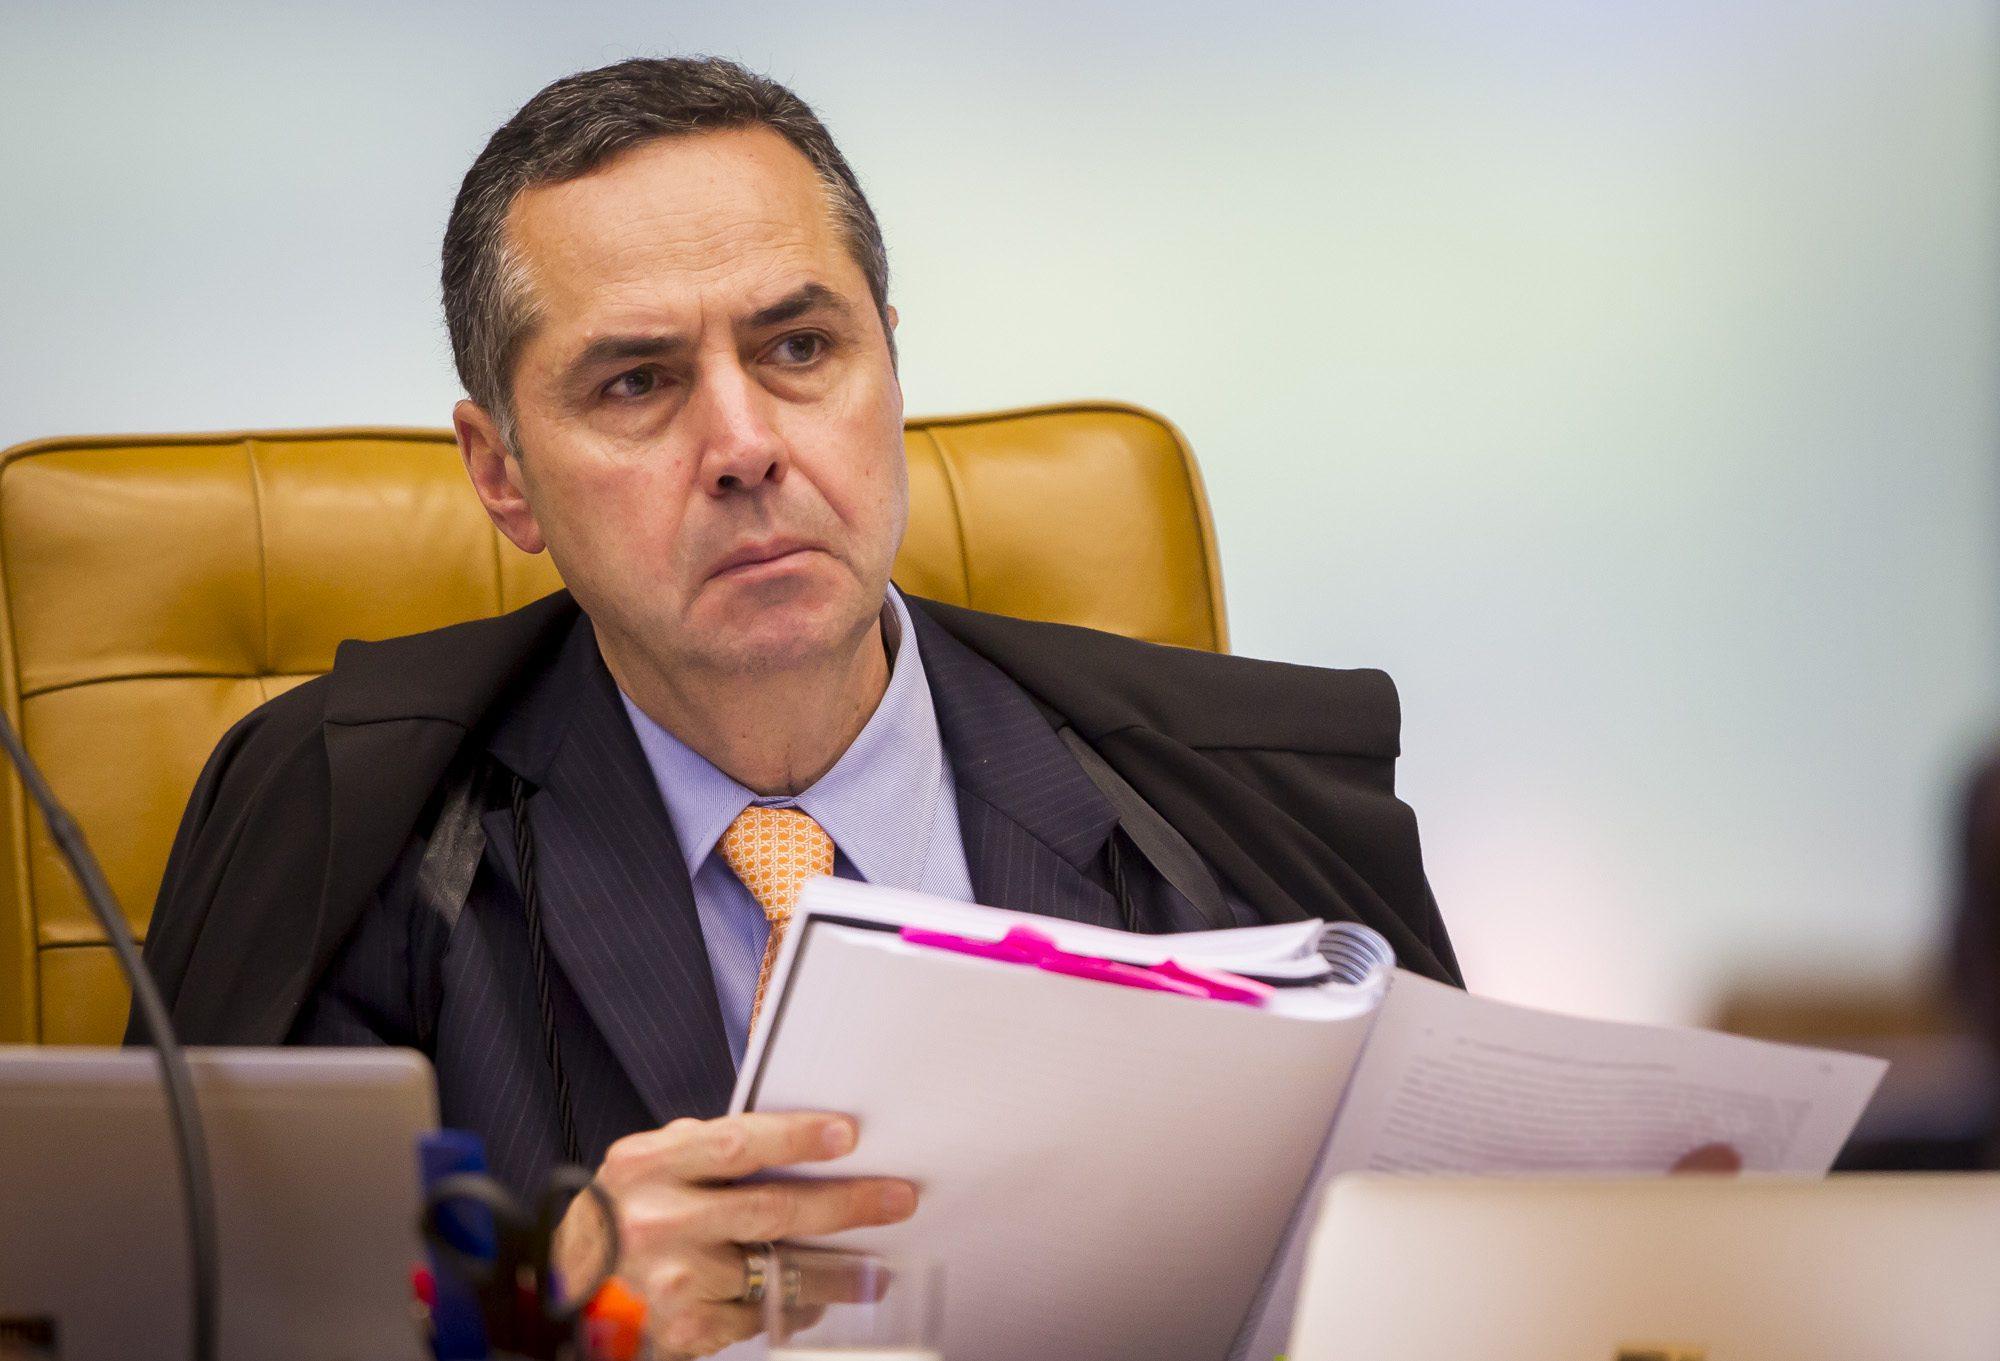 Ministro Luís Barroso conanda